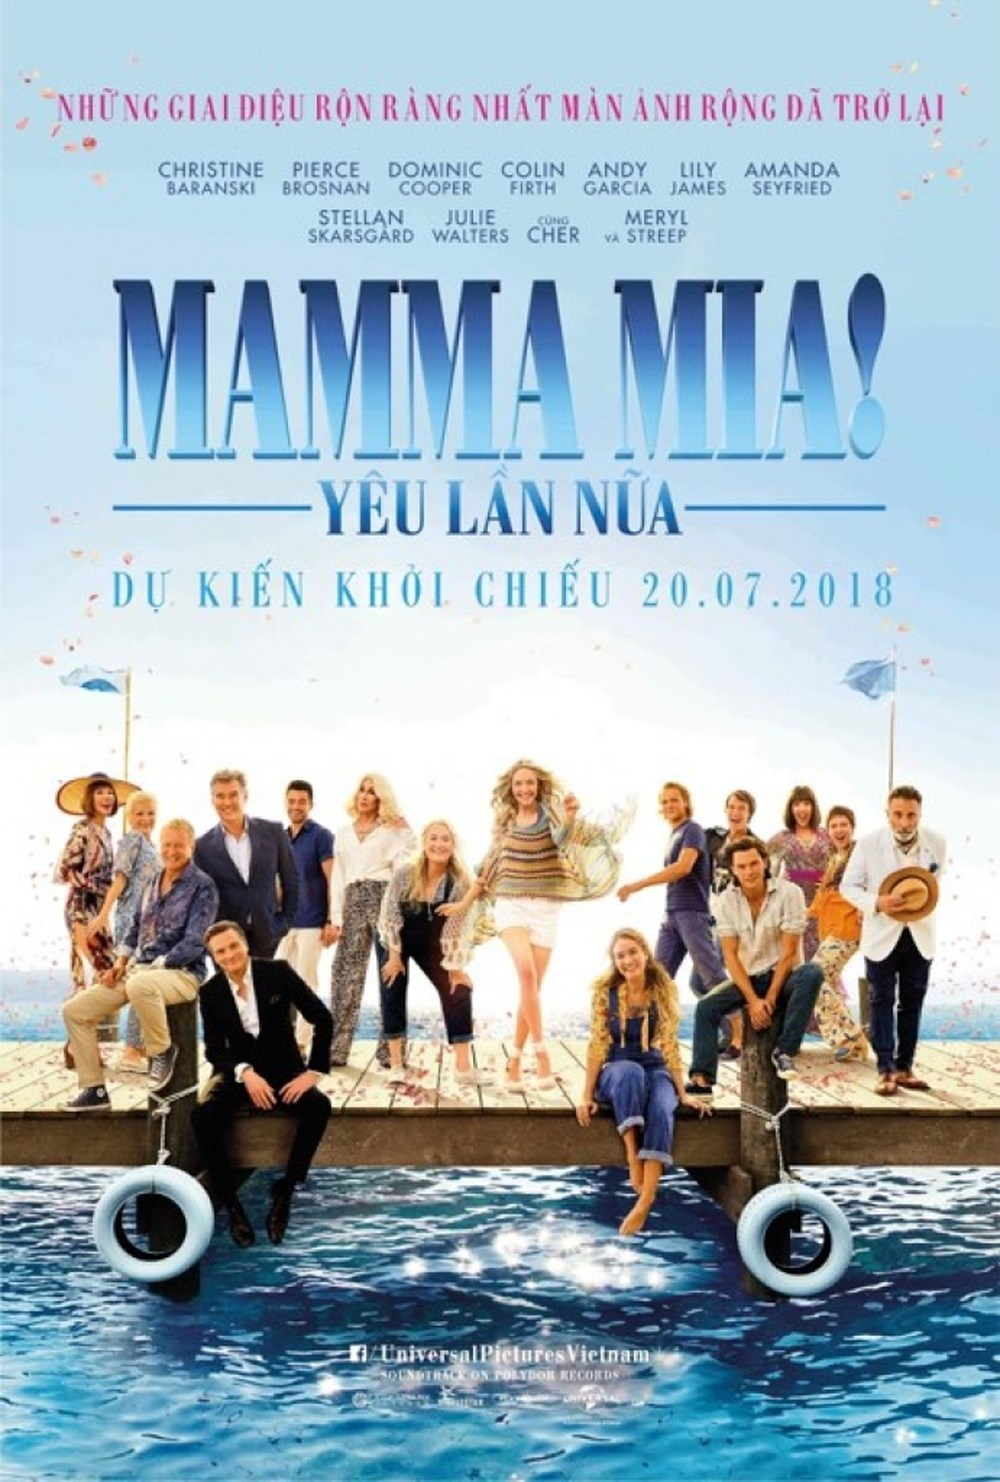 review phim Mamma Mia Yeu lan nua anh 1